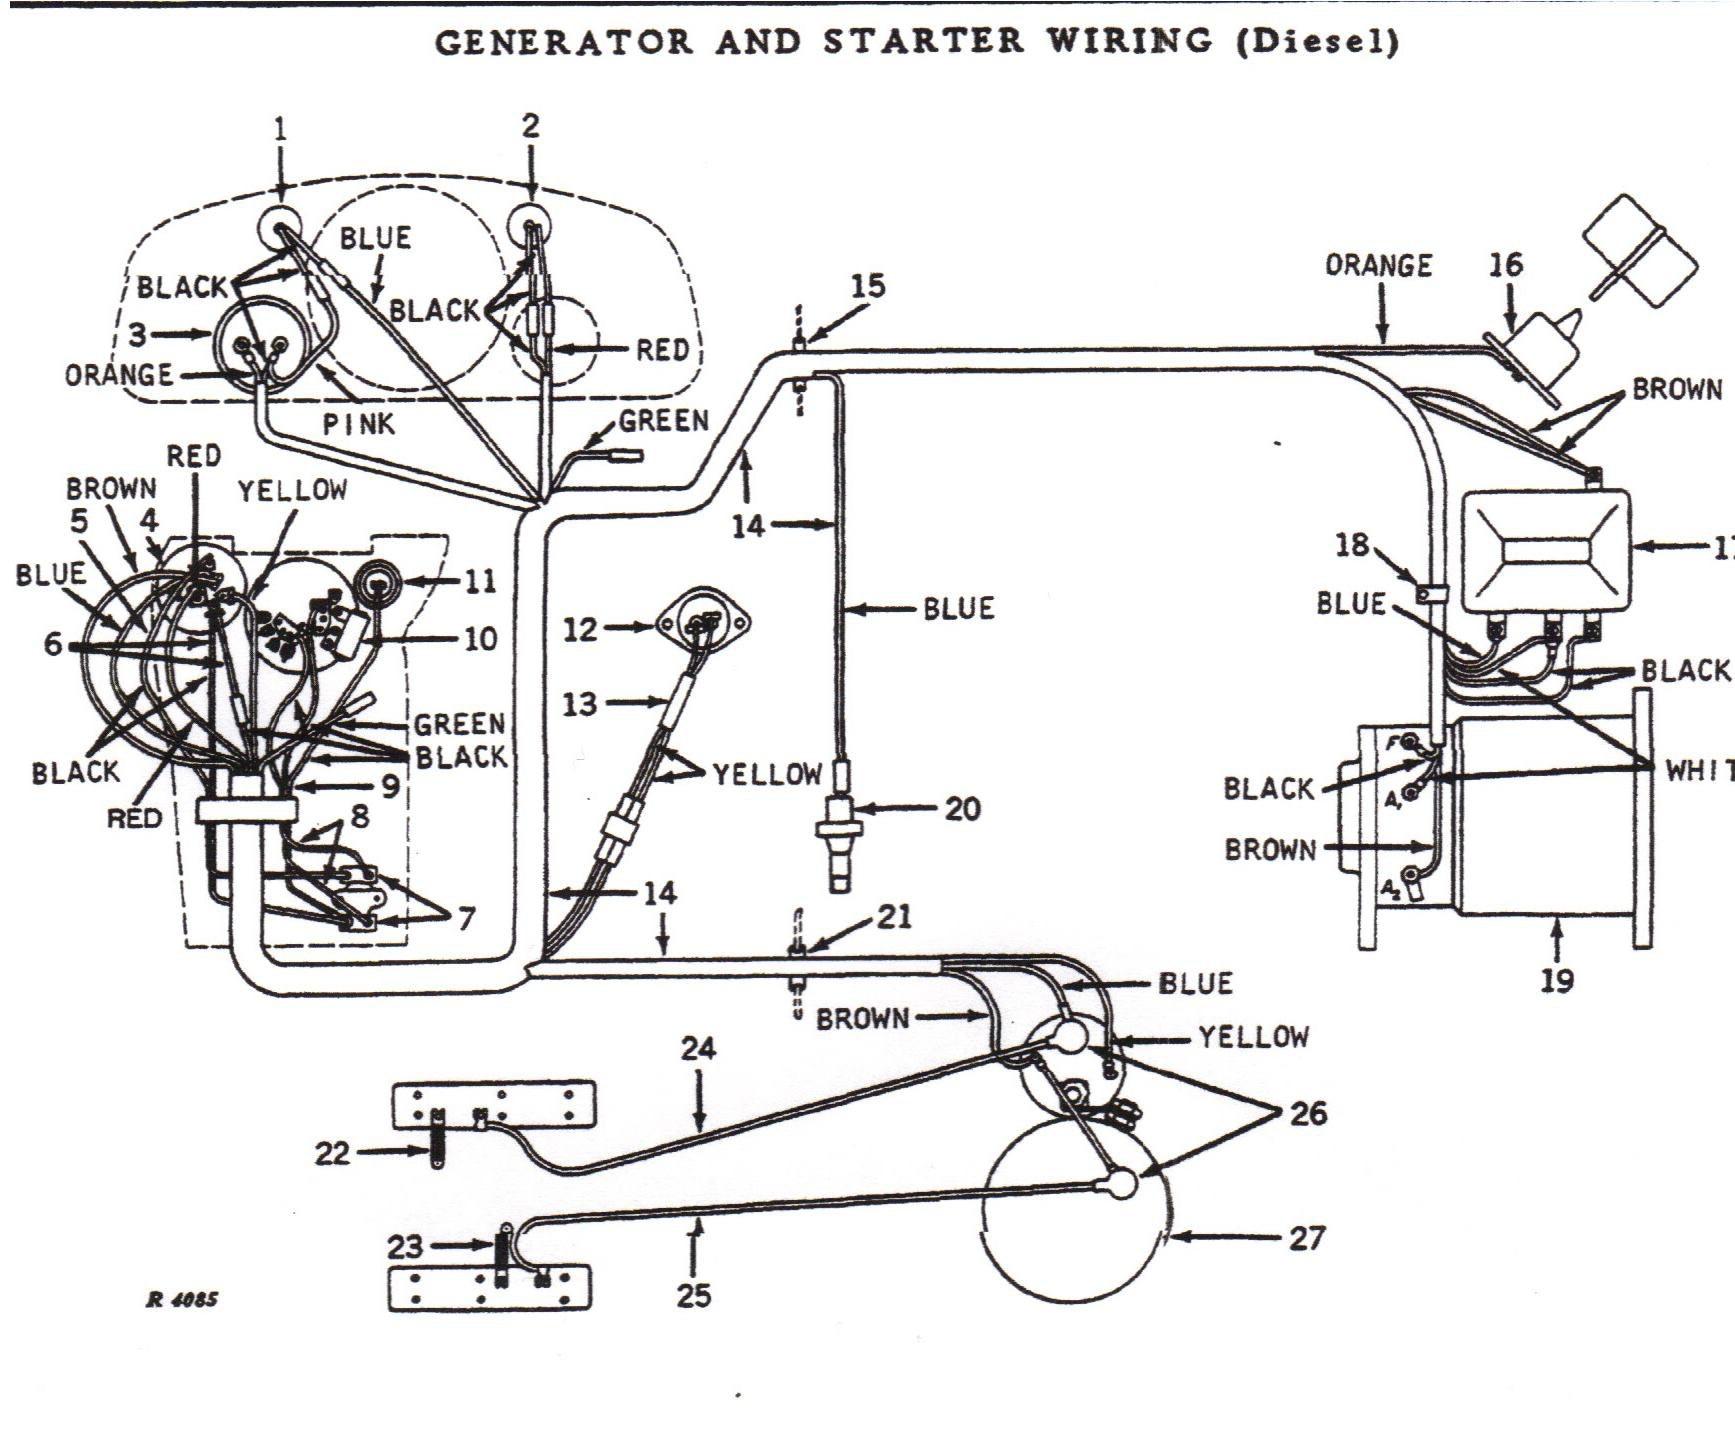 Car Starter Parts Diagram Yamaha G2 Wiring G2a Stx 38 Of